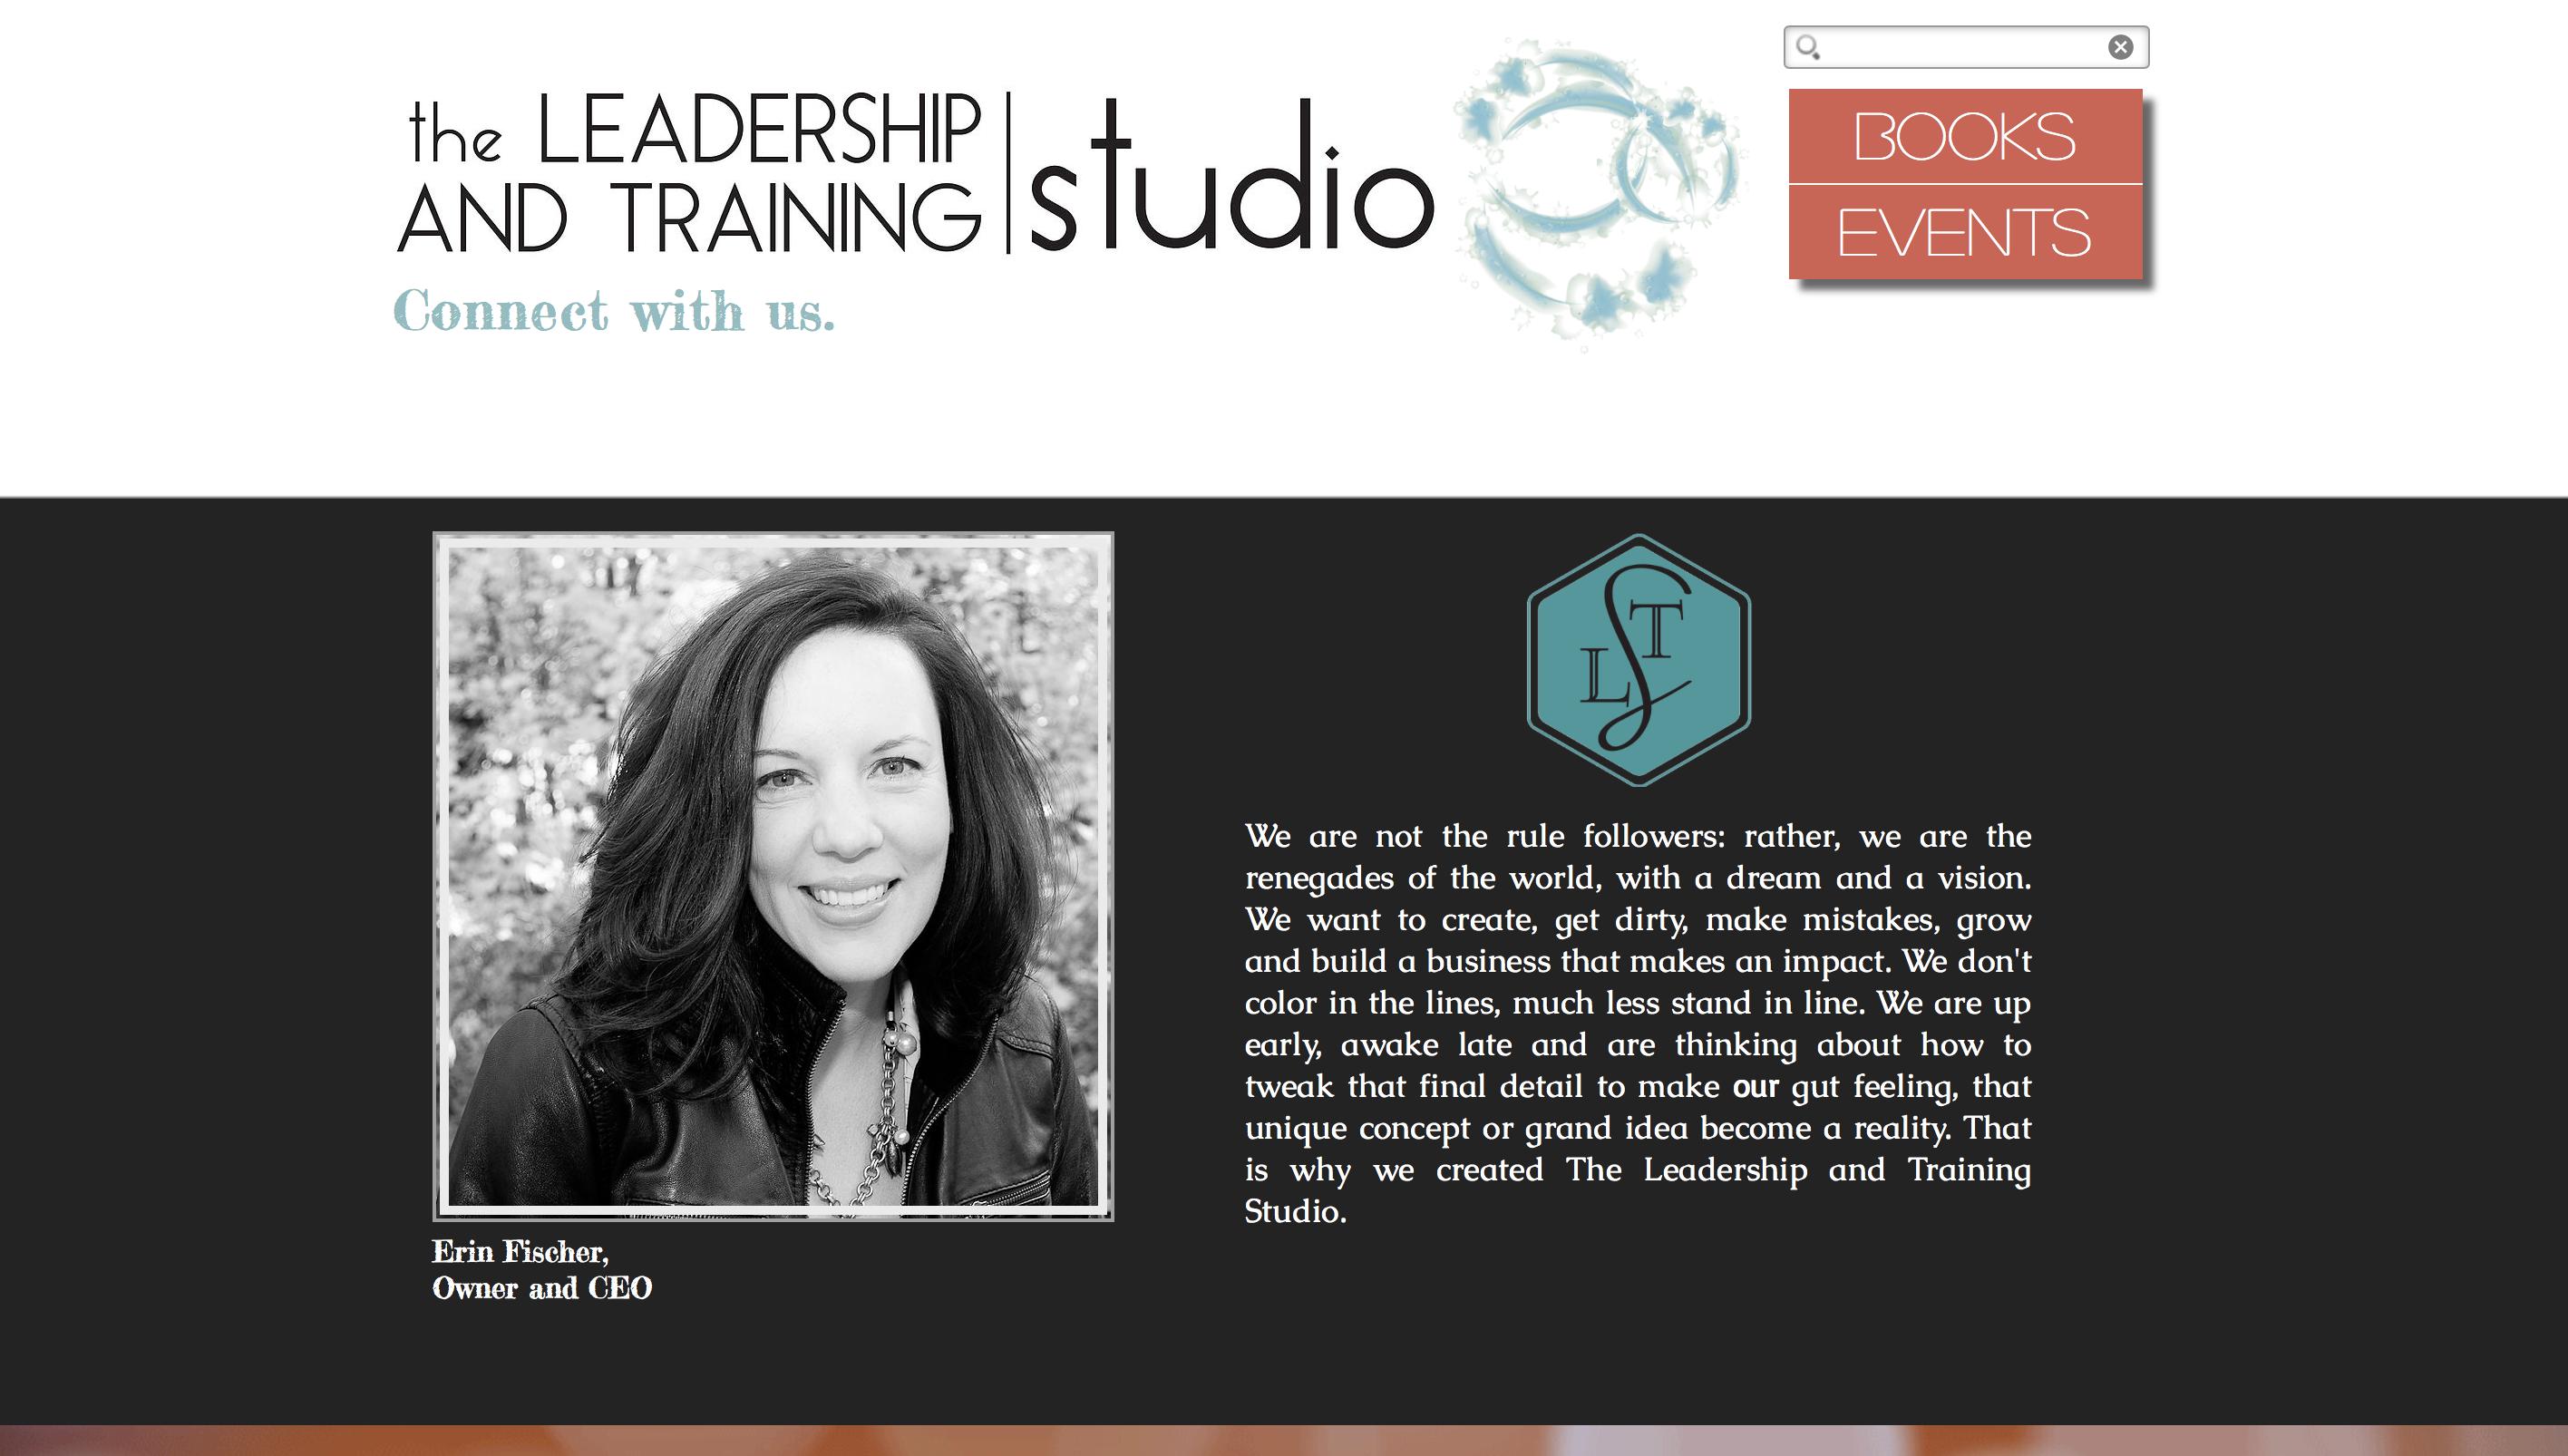 The Leadership and Training Studio